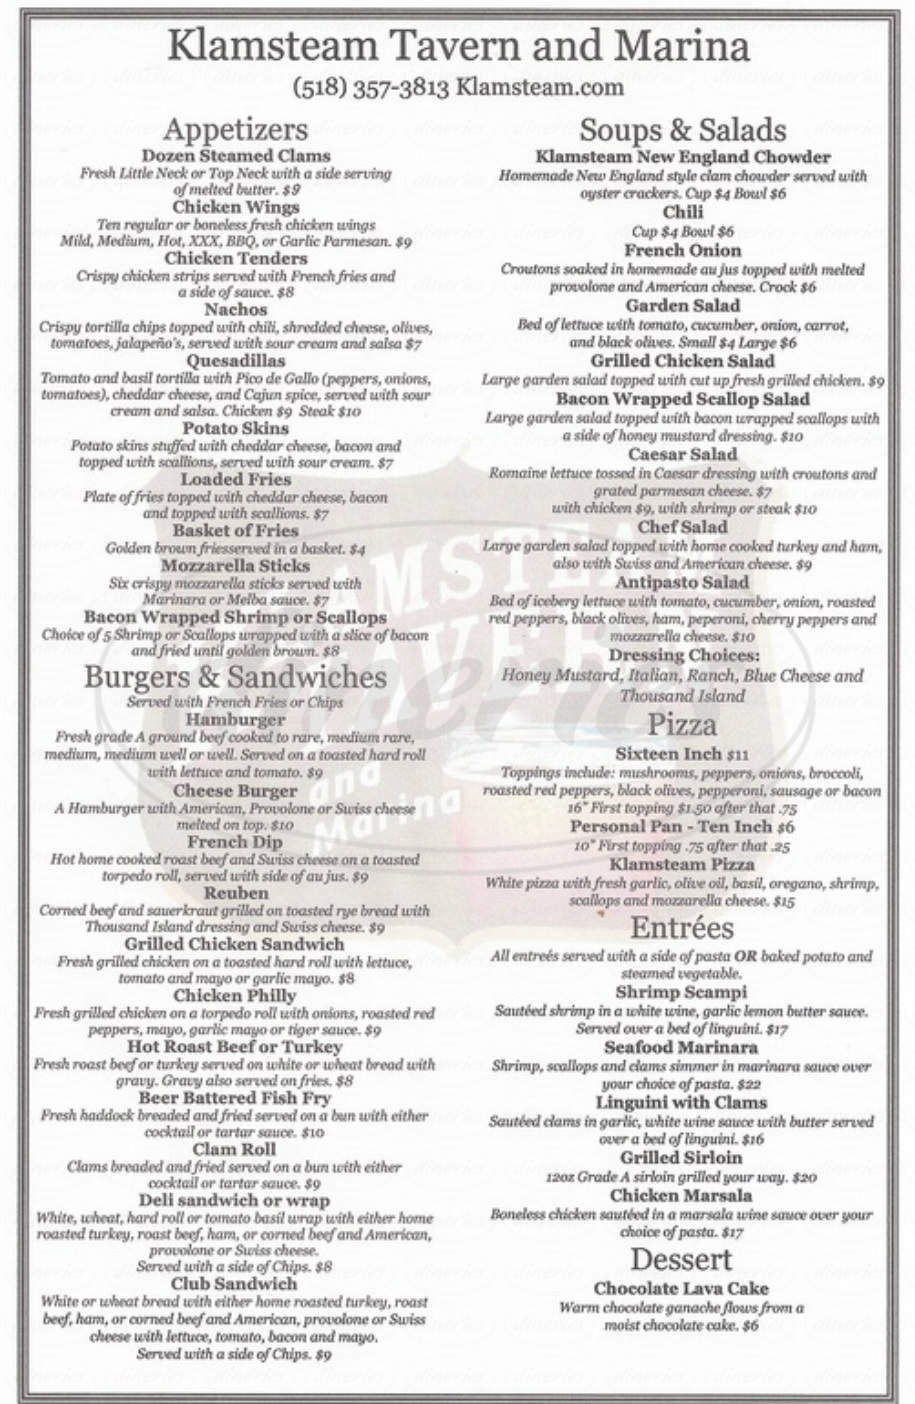 menu for Klamsteam Tavern and Marina LLC